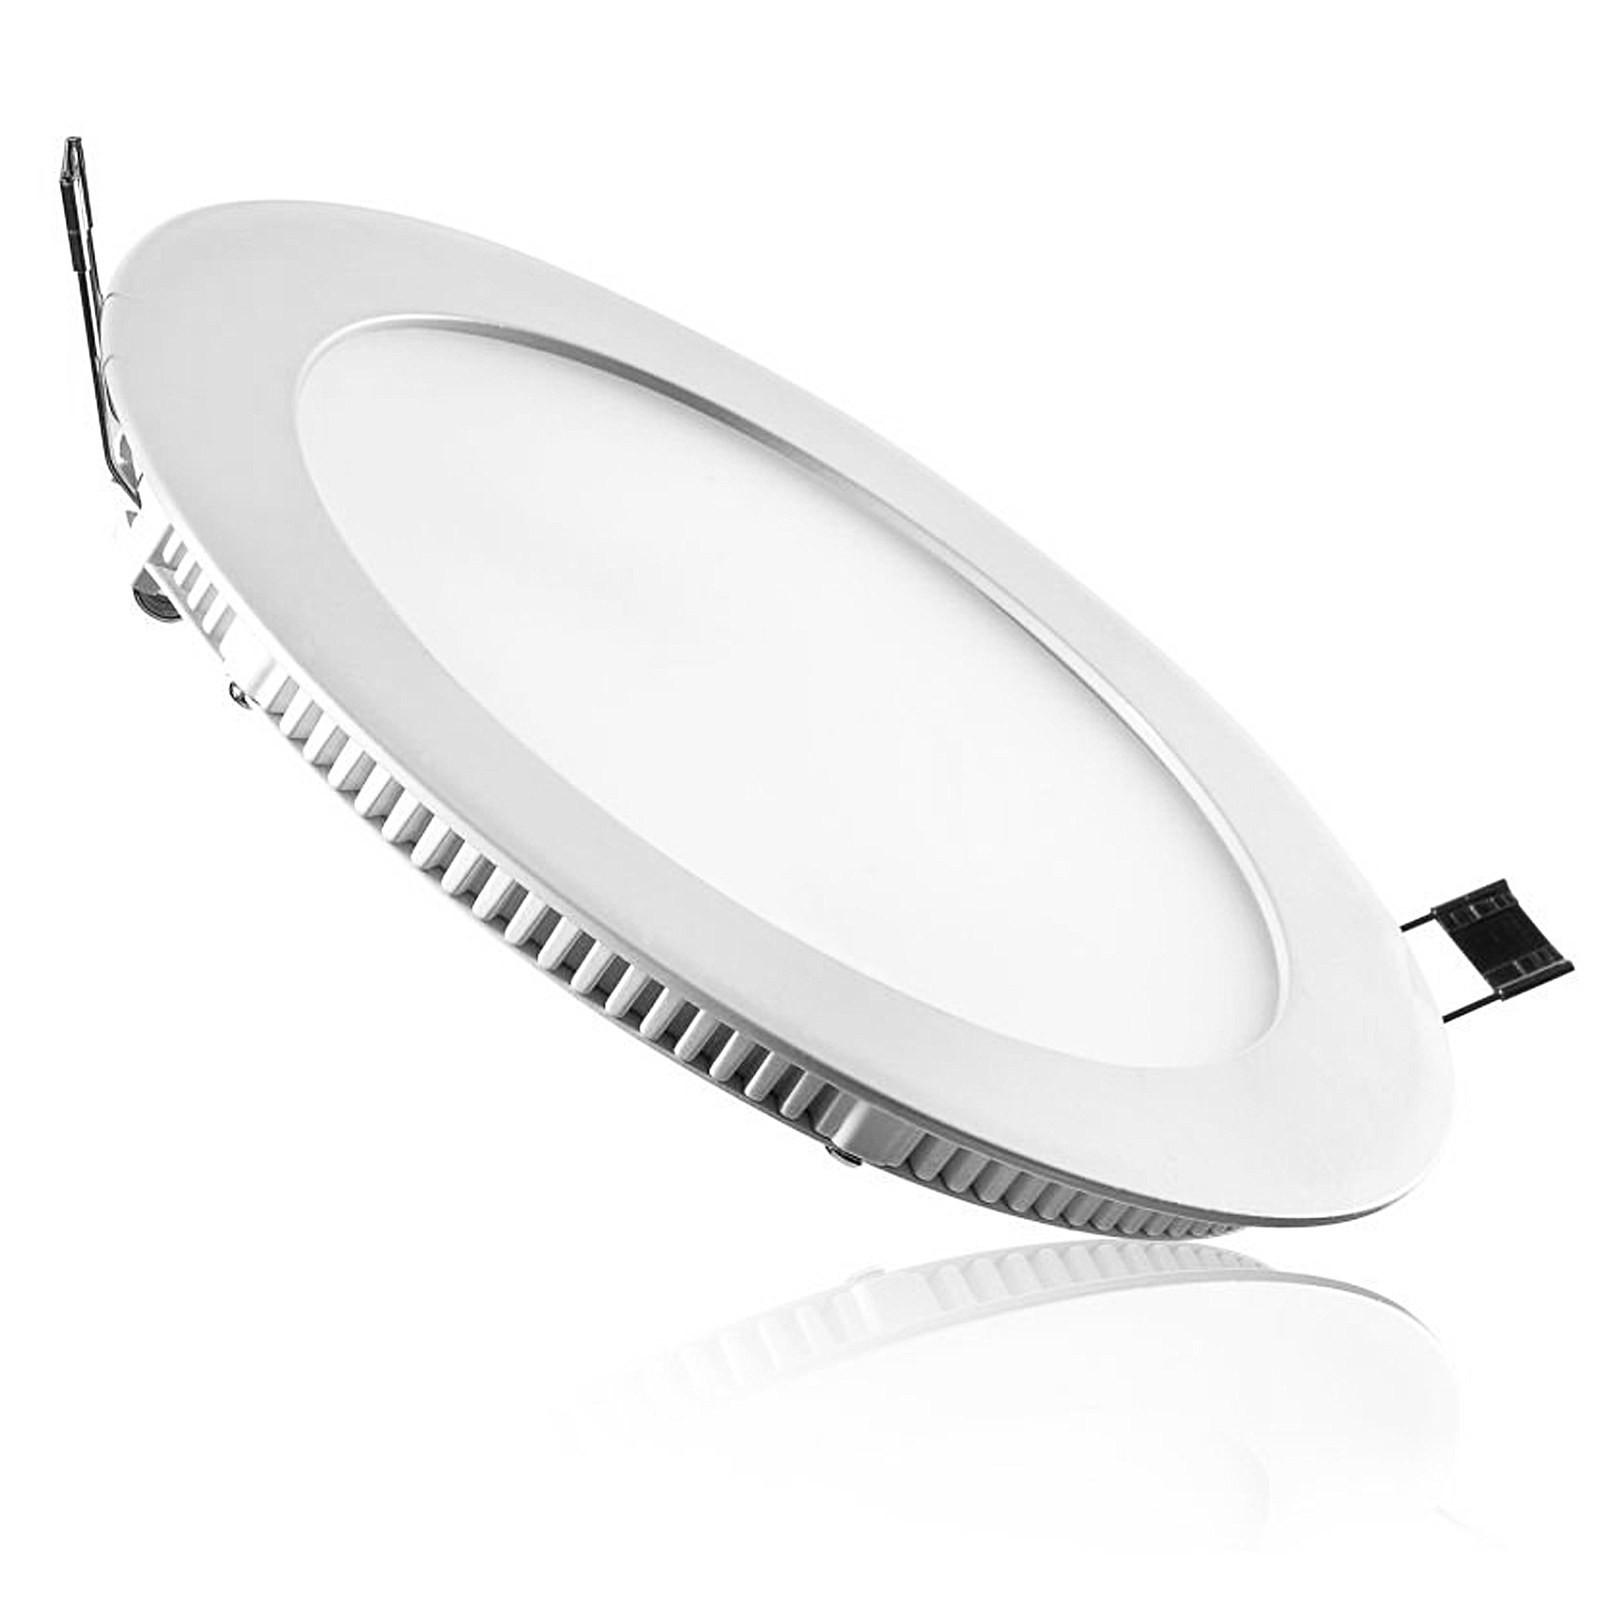 Faro faretto pannello led luce bianca fredda 20 watt for Luce bianca led